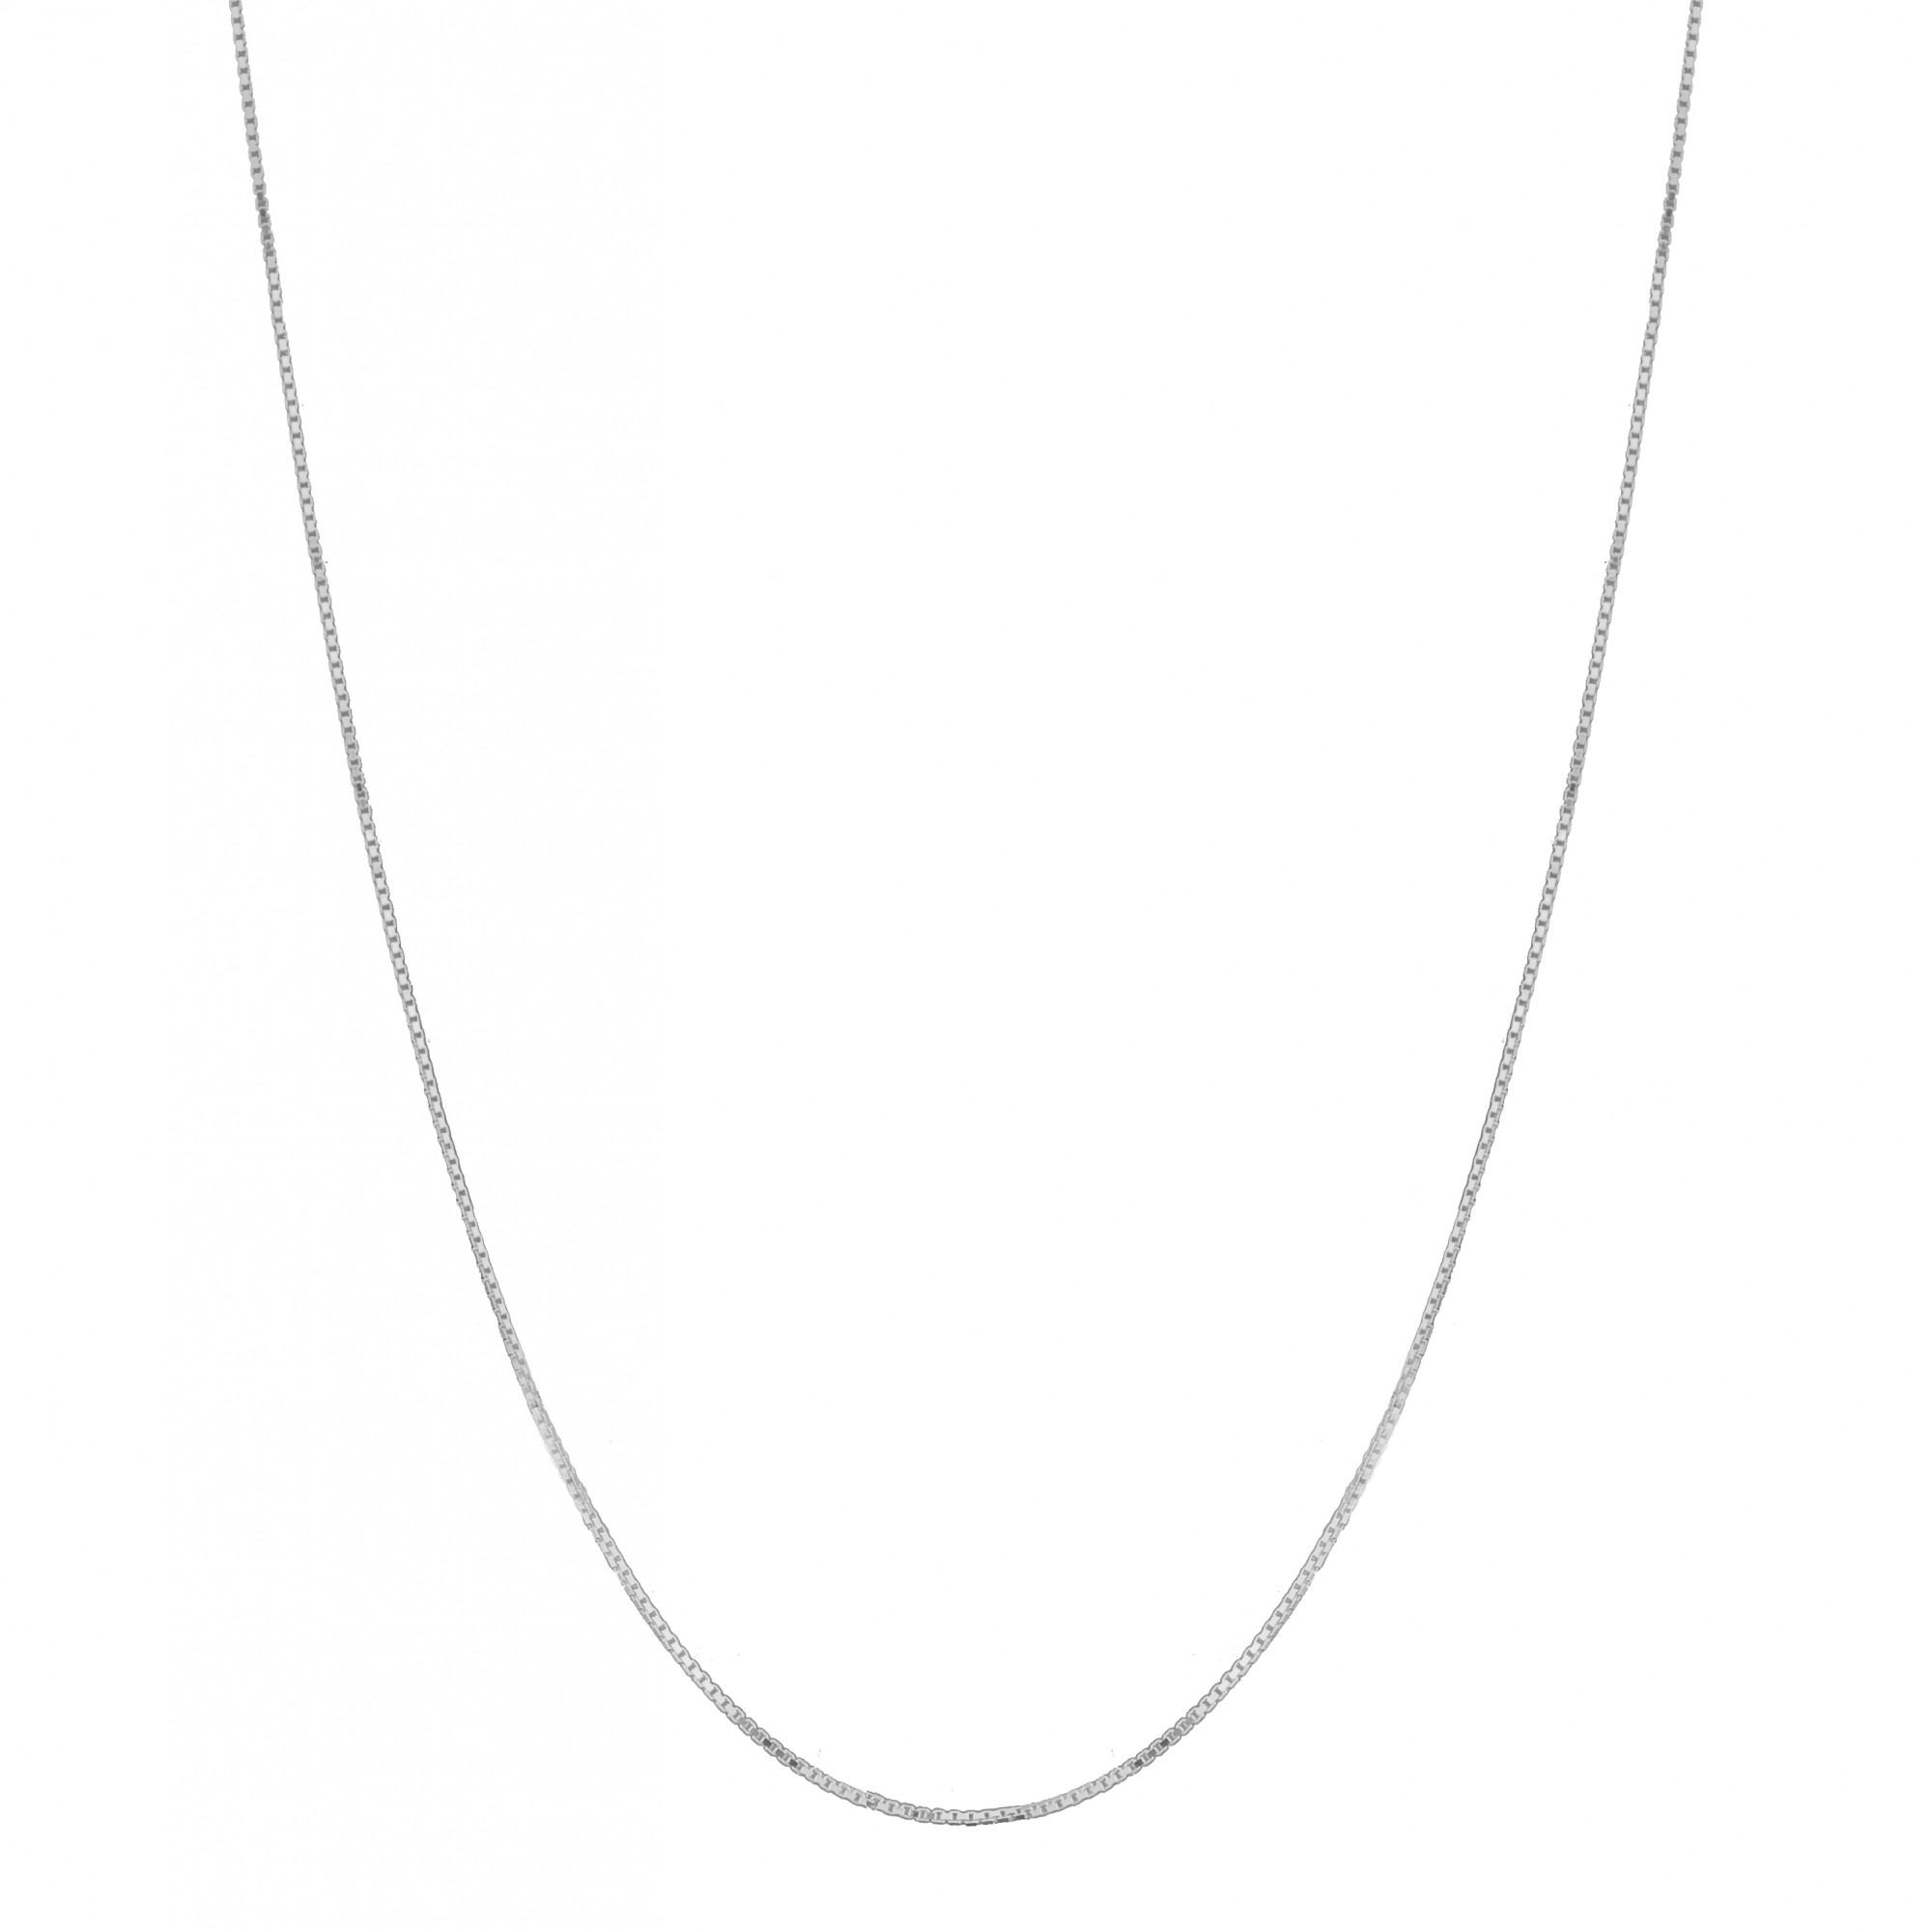 Corrente Colar Veneziana 40cm Prata 925